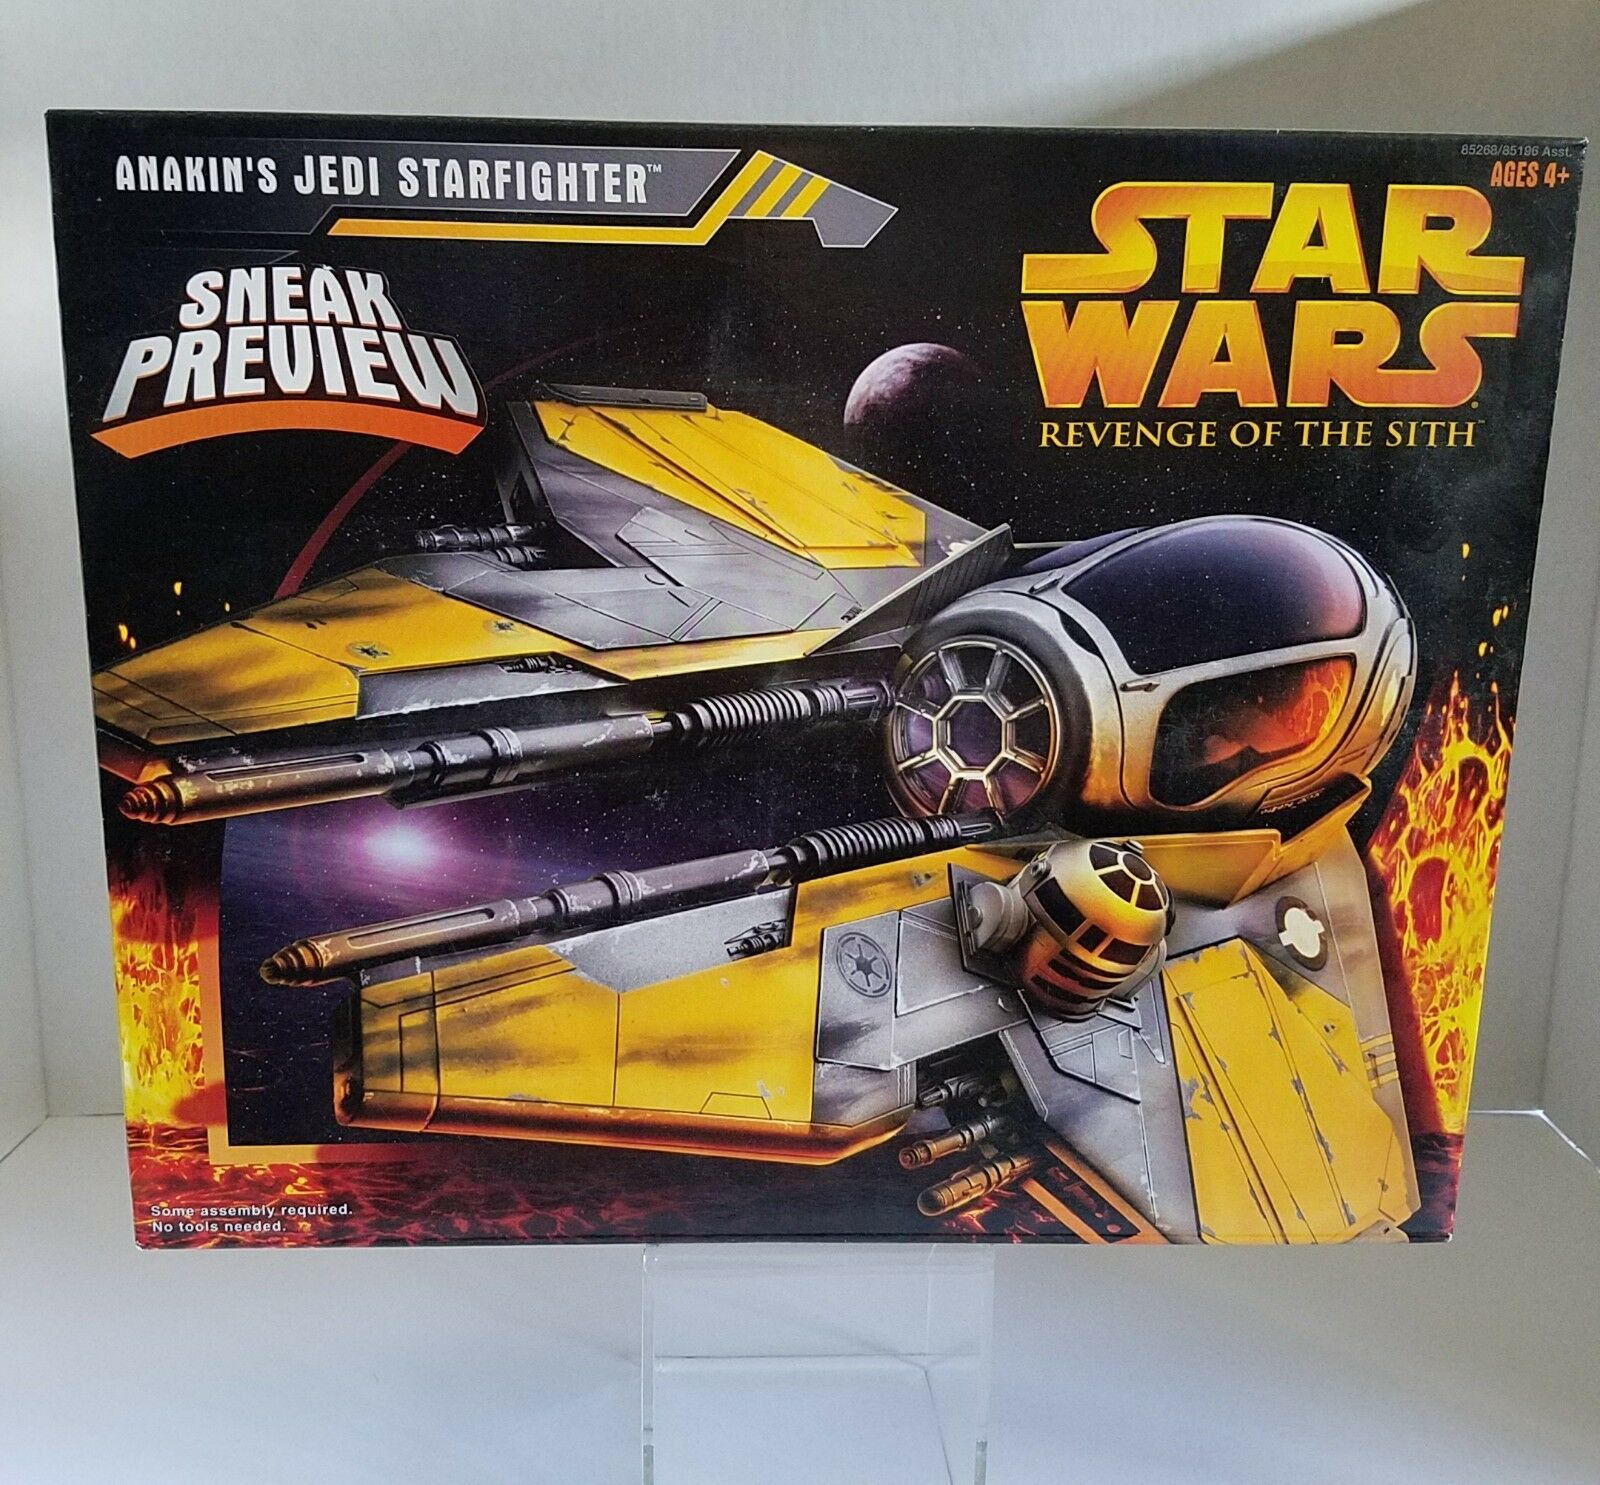 Hasbro 2005 Star Star Star Wars Anakin's Jedi Starfighter Collectible Action Figure de3845